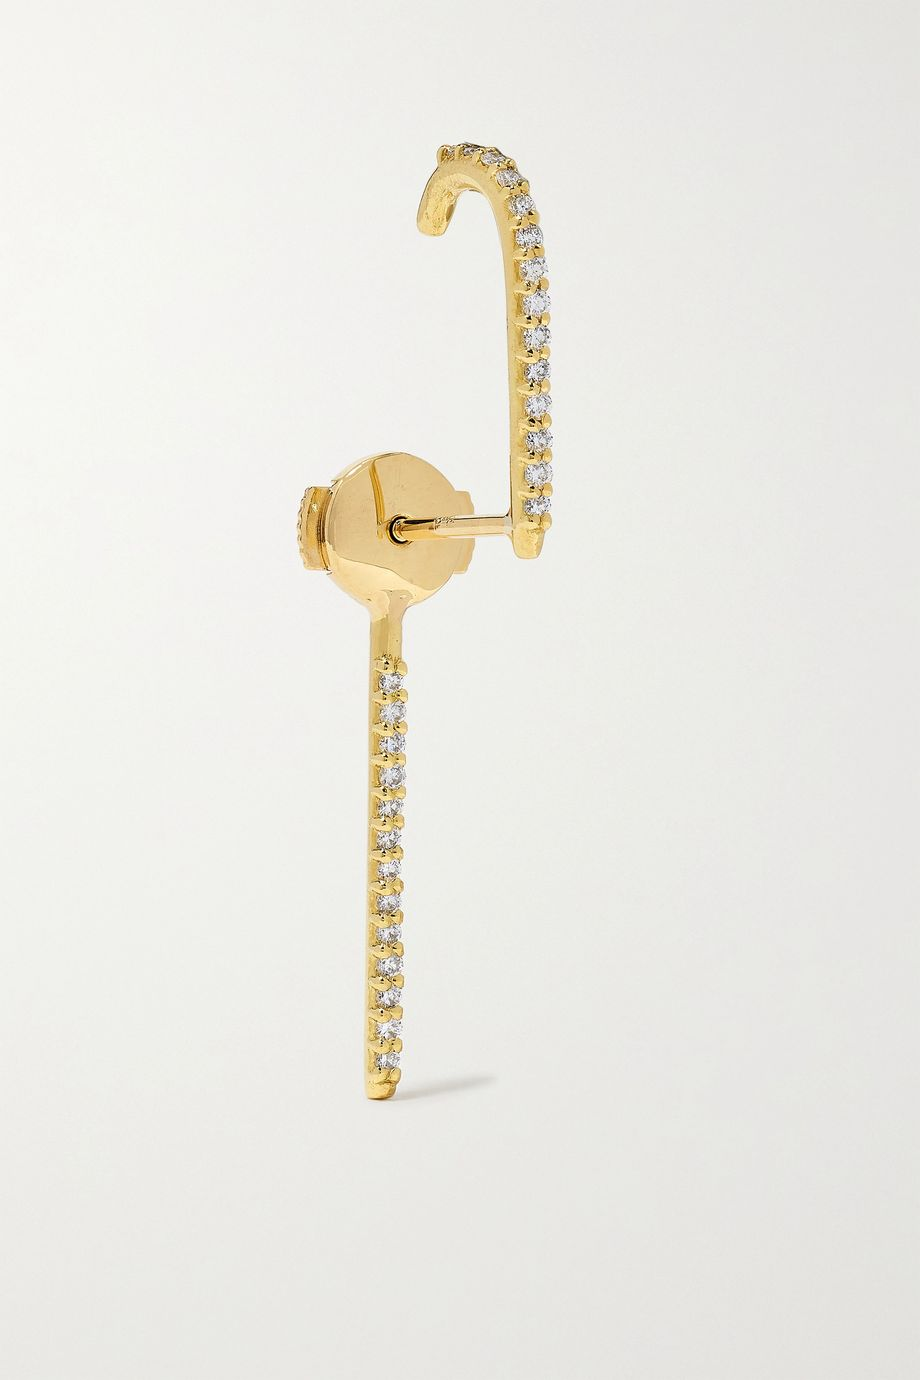 KATKIM Ohrring aus Gold mit Diamanten